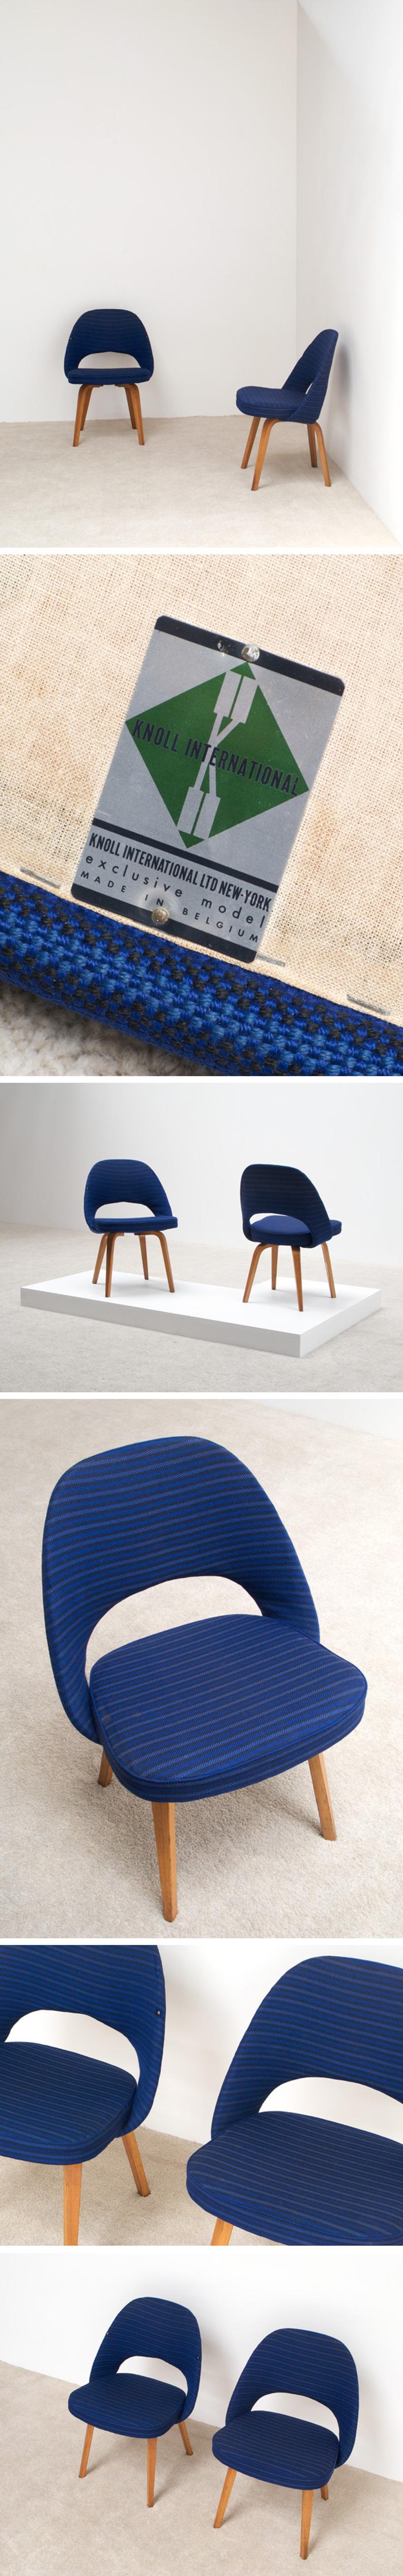 Eero Saarinen 2 side chairs Model 72 ULB for Knoll De Coene Large